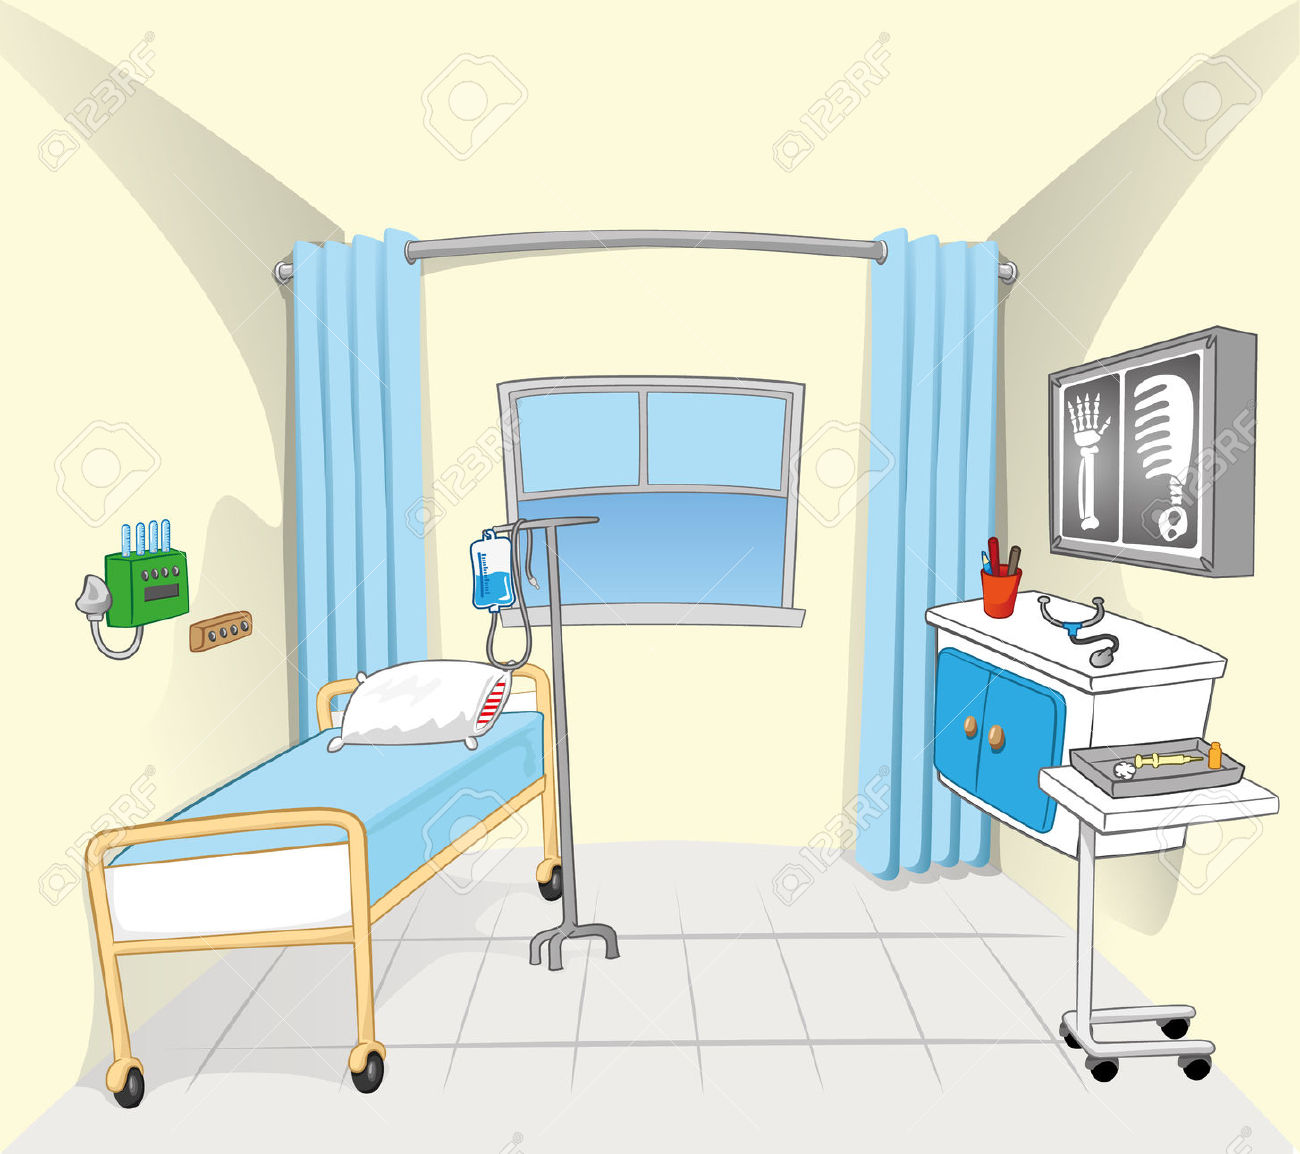 Hospital Room Clipart.